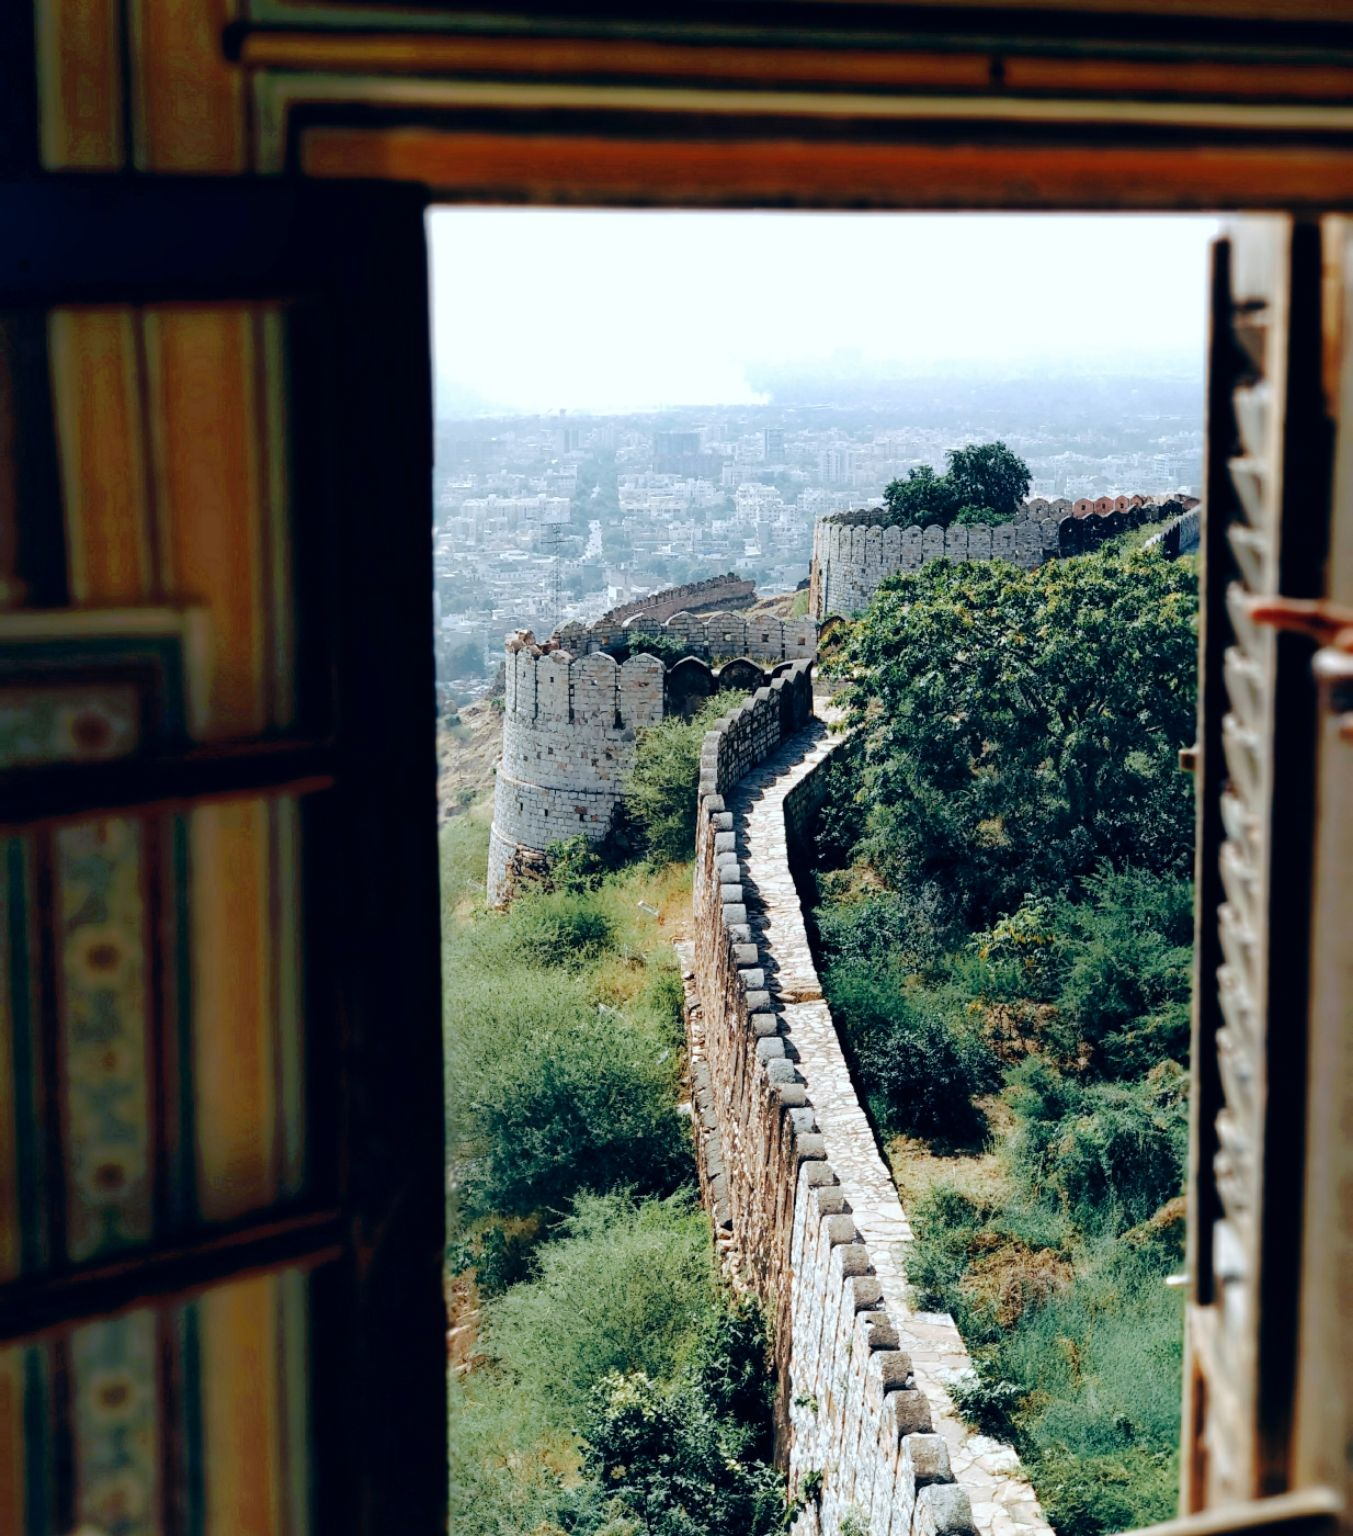 Photo of Jaipur By Swagataa Chatterjee